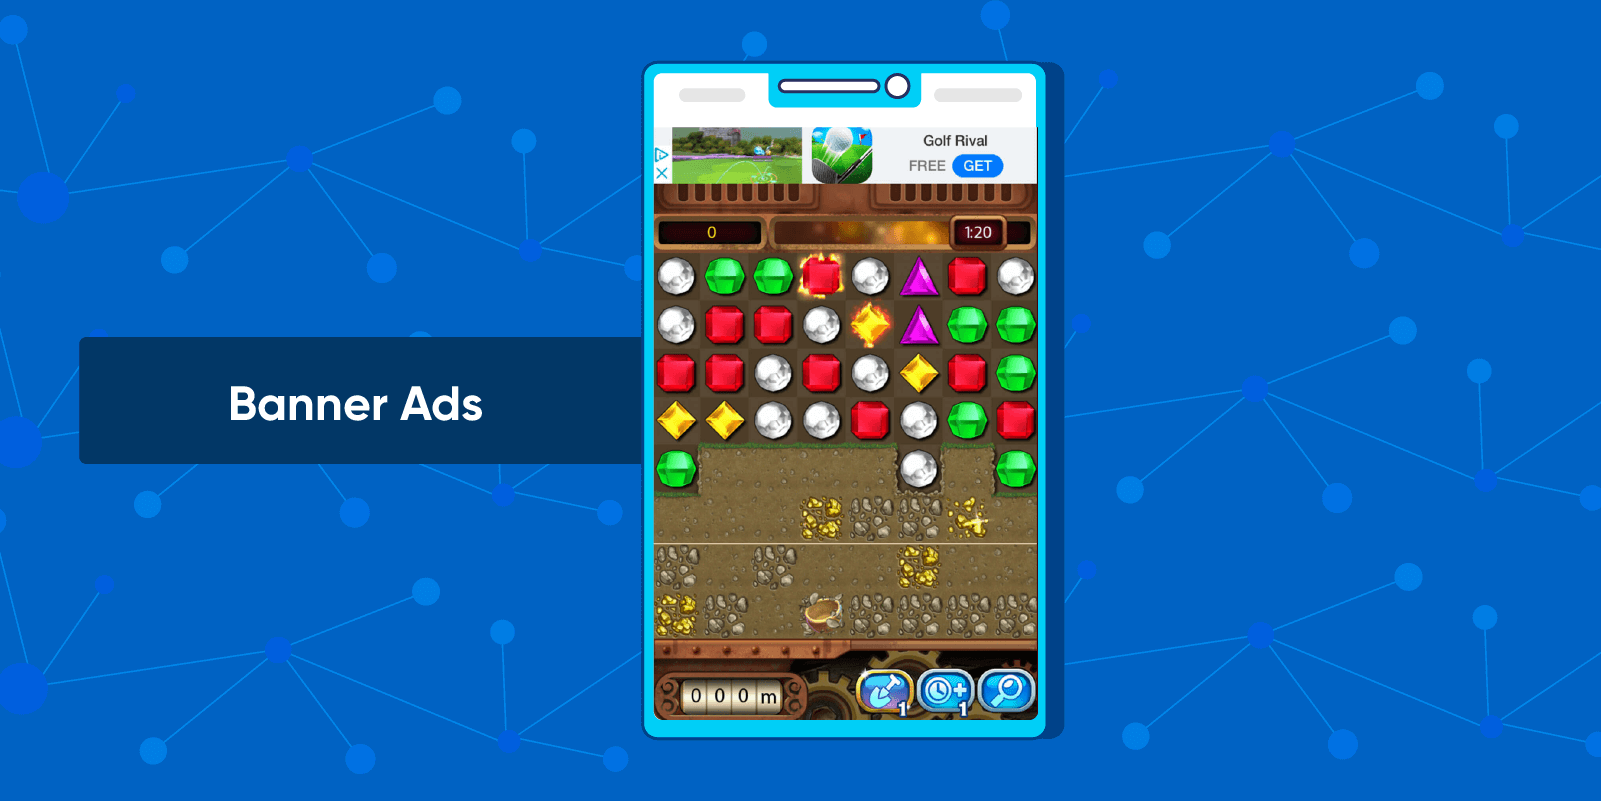 Mobile Ad Networks for App Monetization   VDO.AI